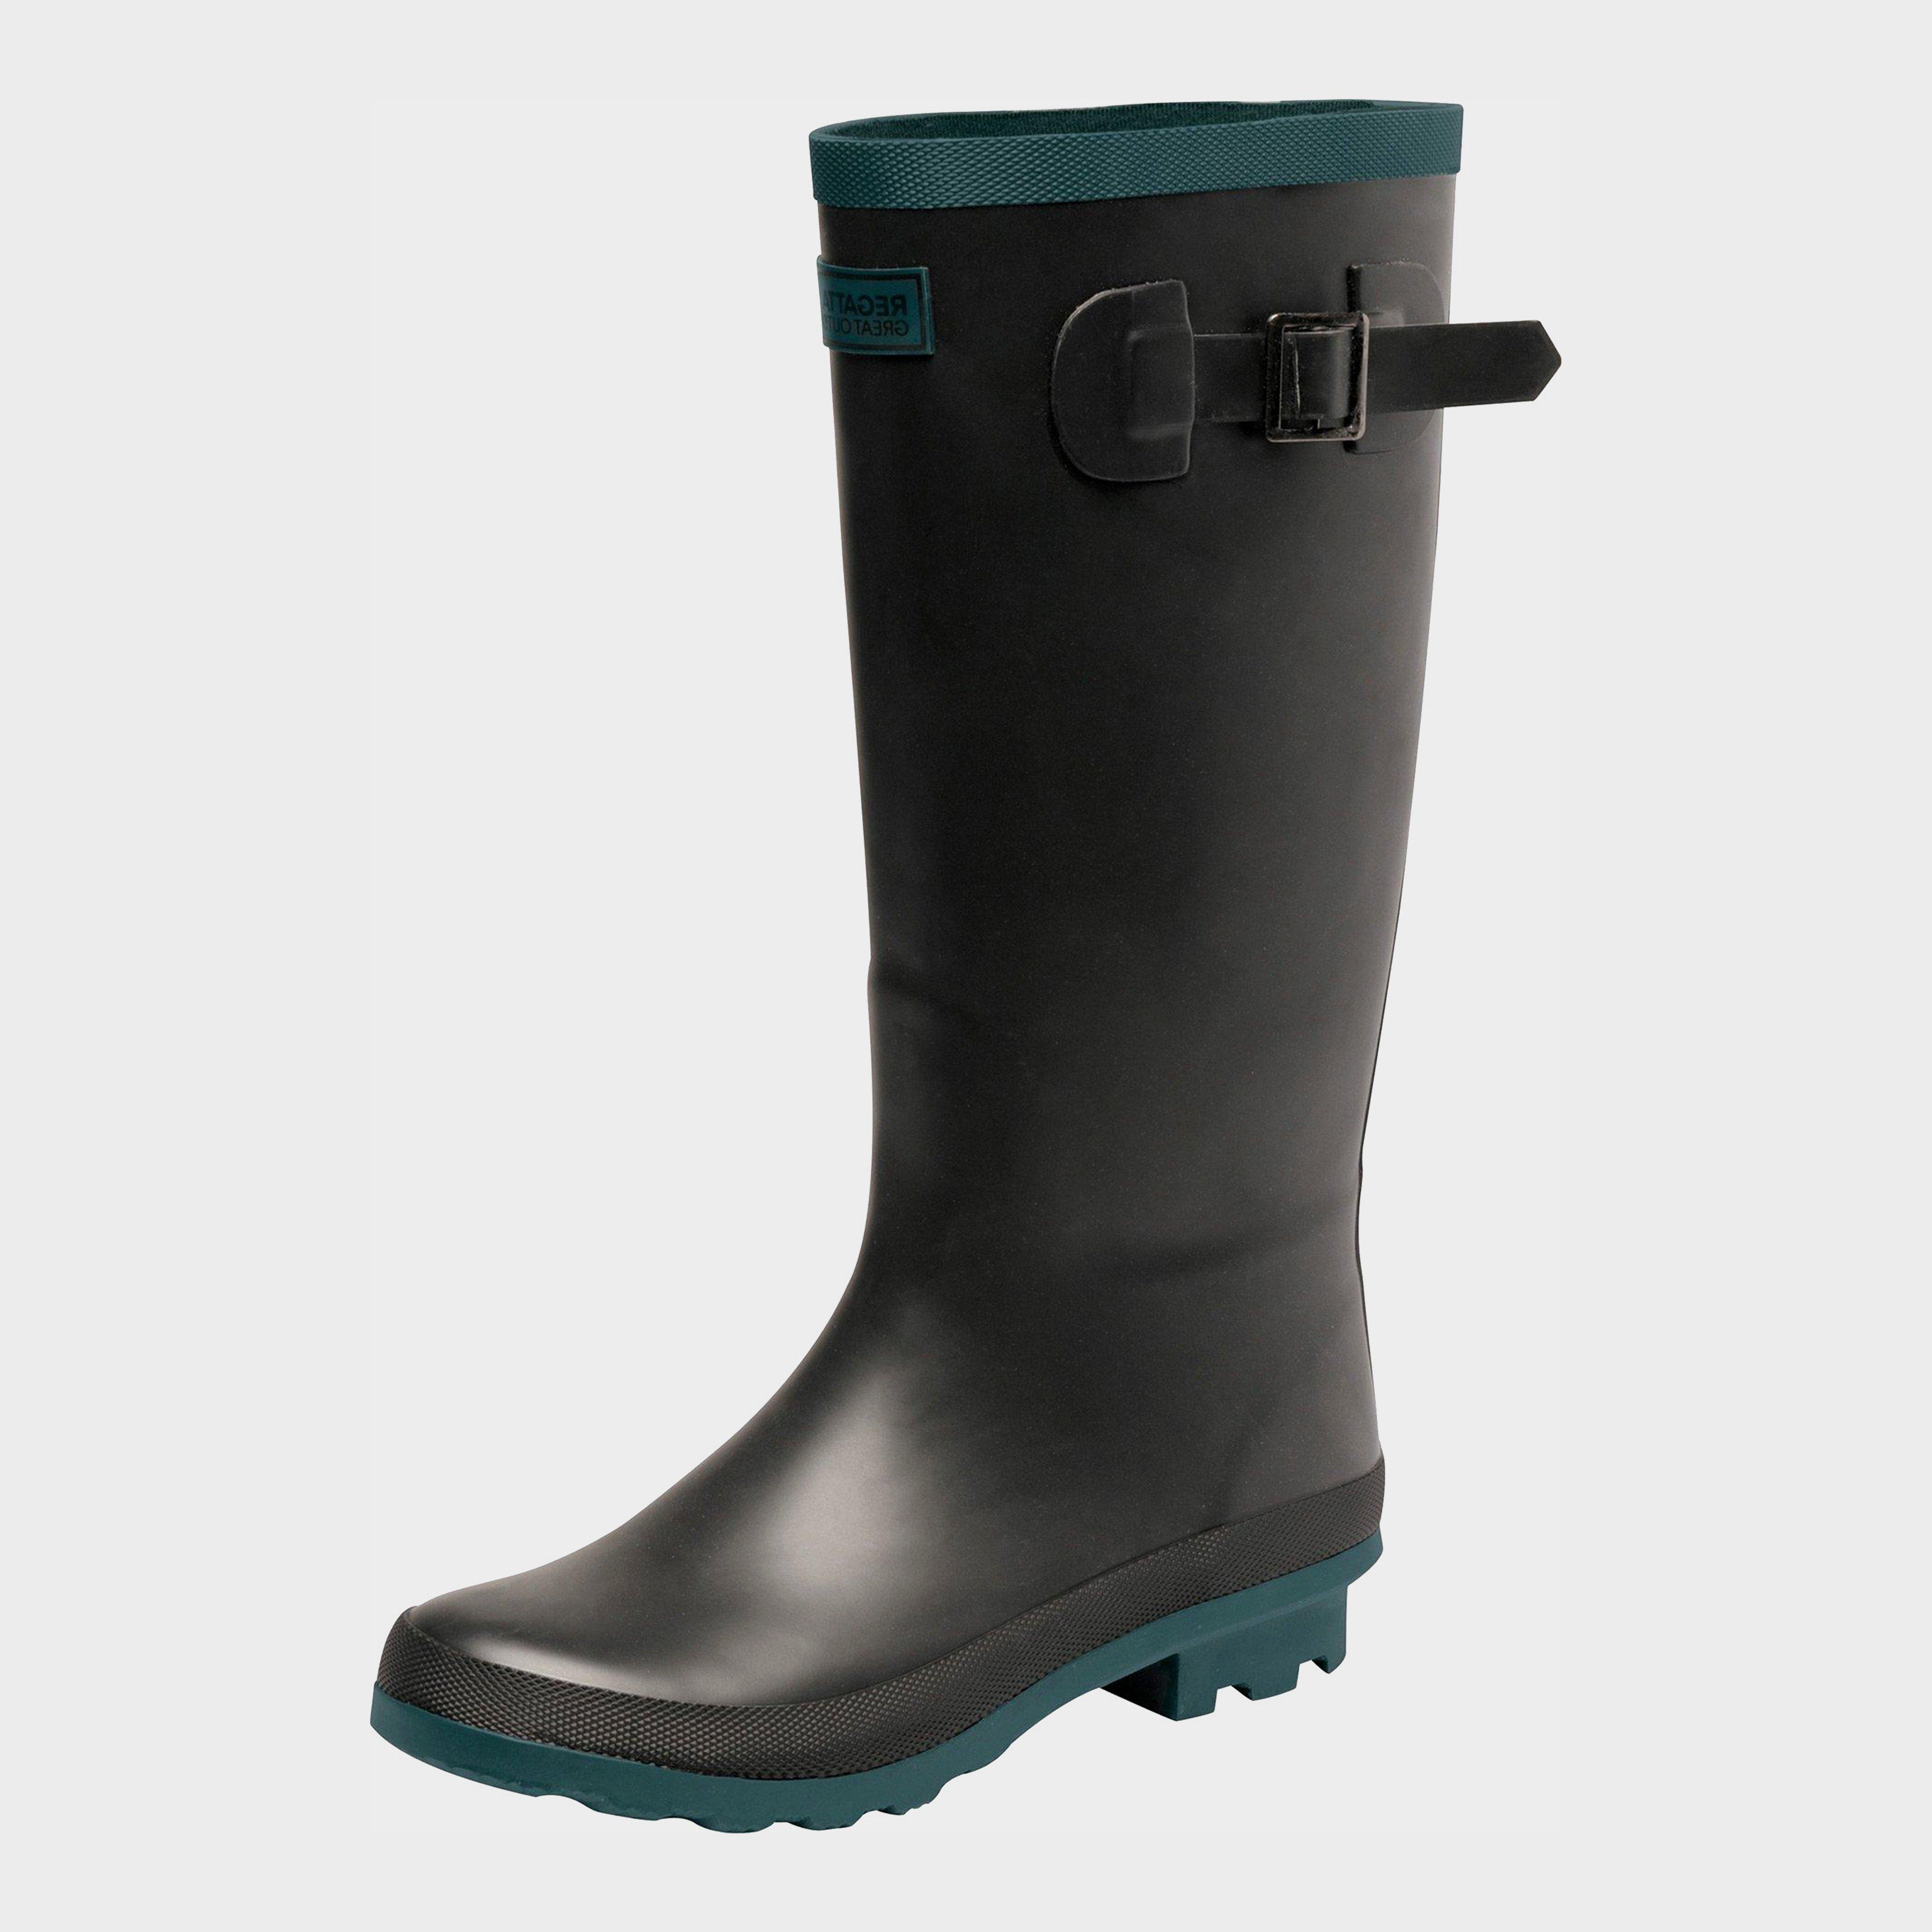 Regatta Women's Lady Fairweather Ii Wellington Boots -